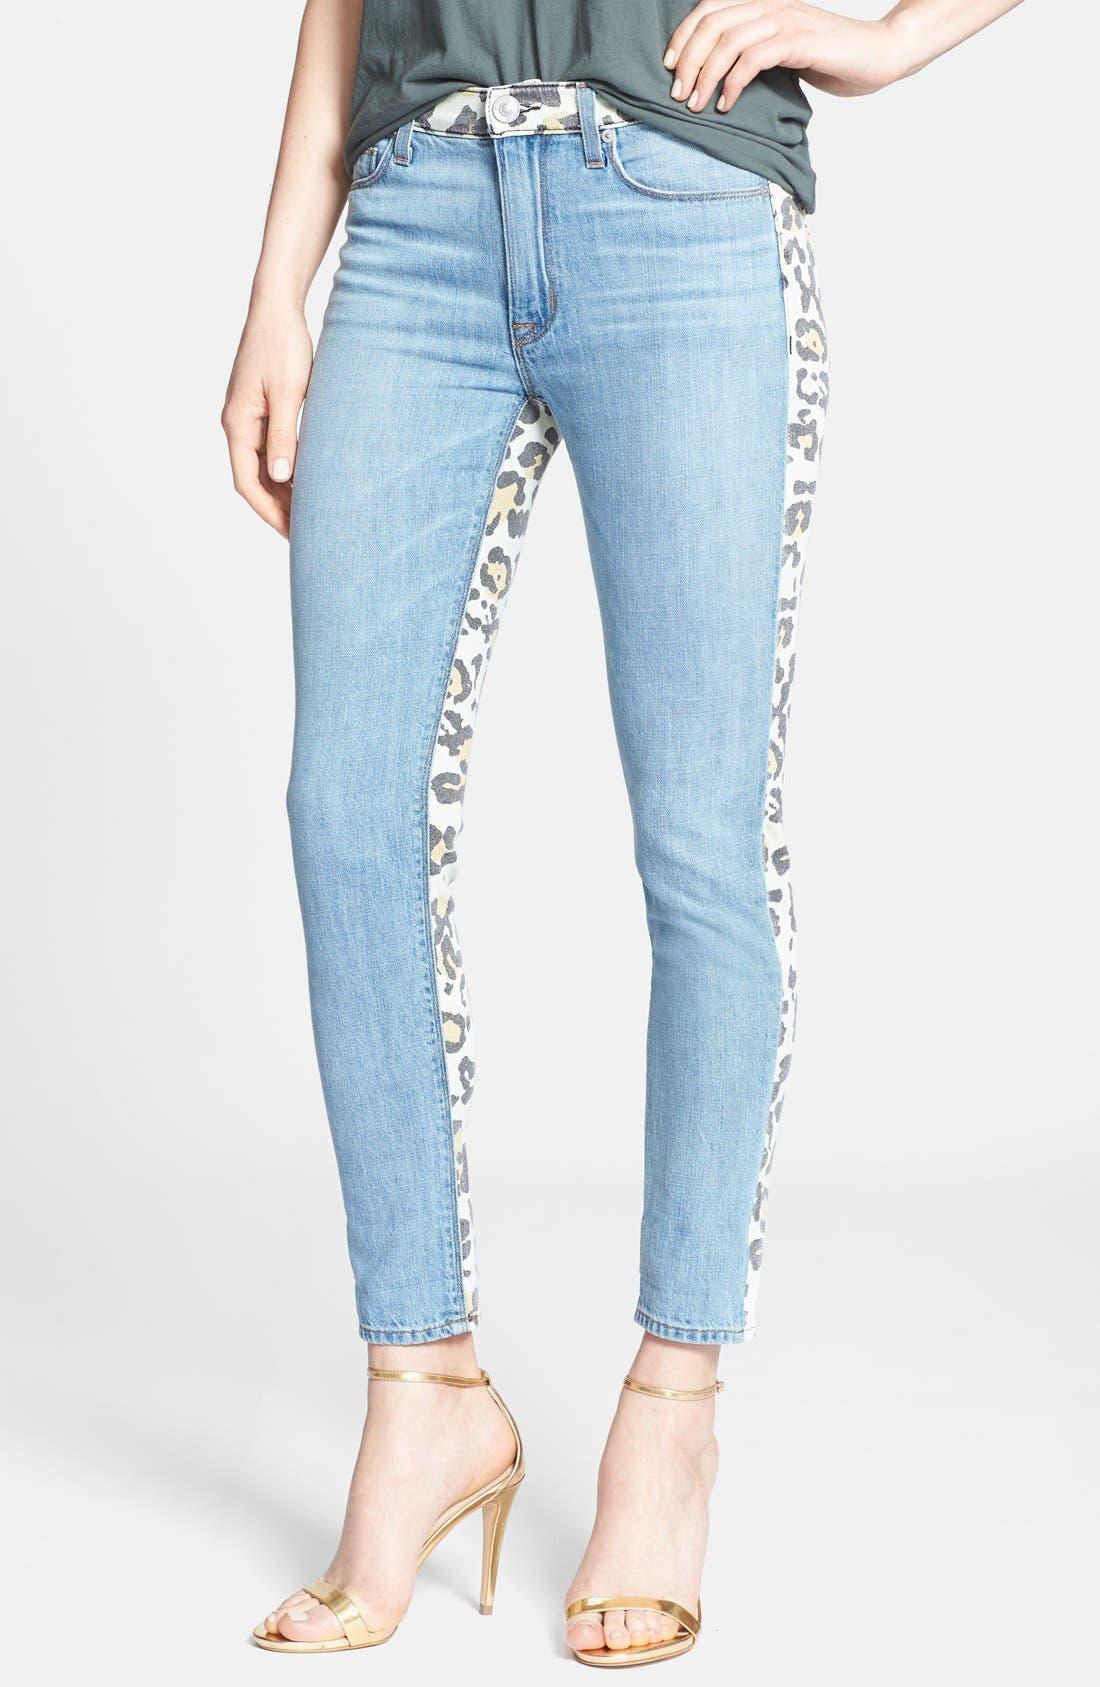 Alternate Image 1 Selected - Hudson Jeans 'Patti' Print Back Skinny Jeans (Posterior Prey)